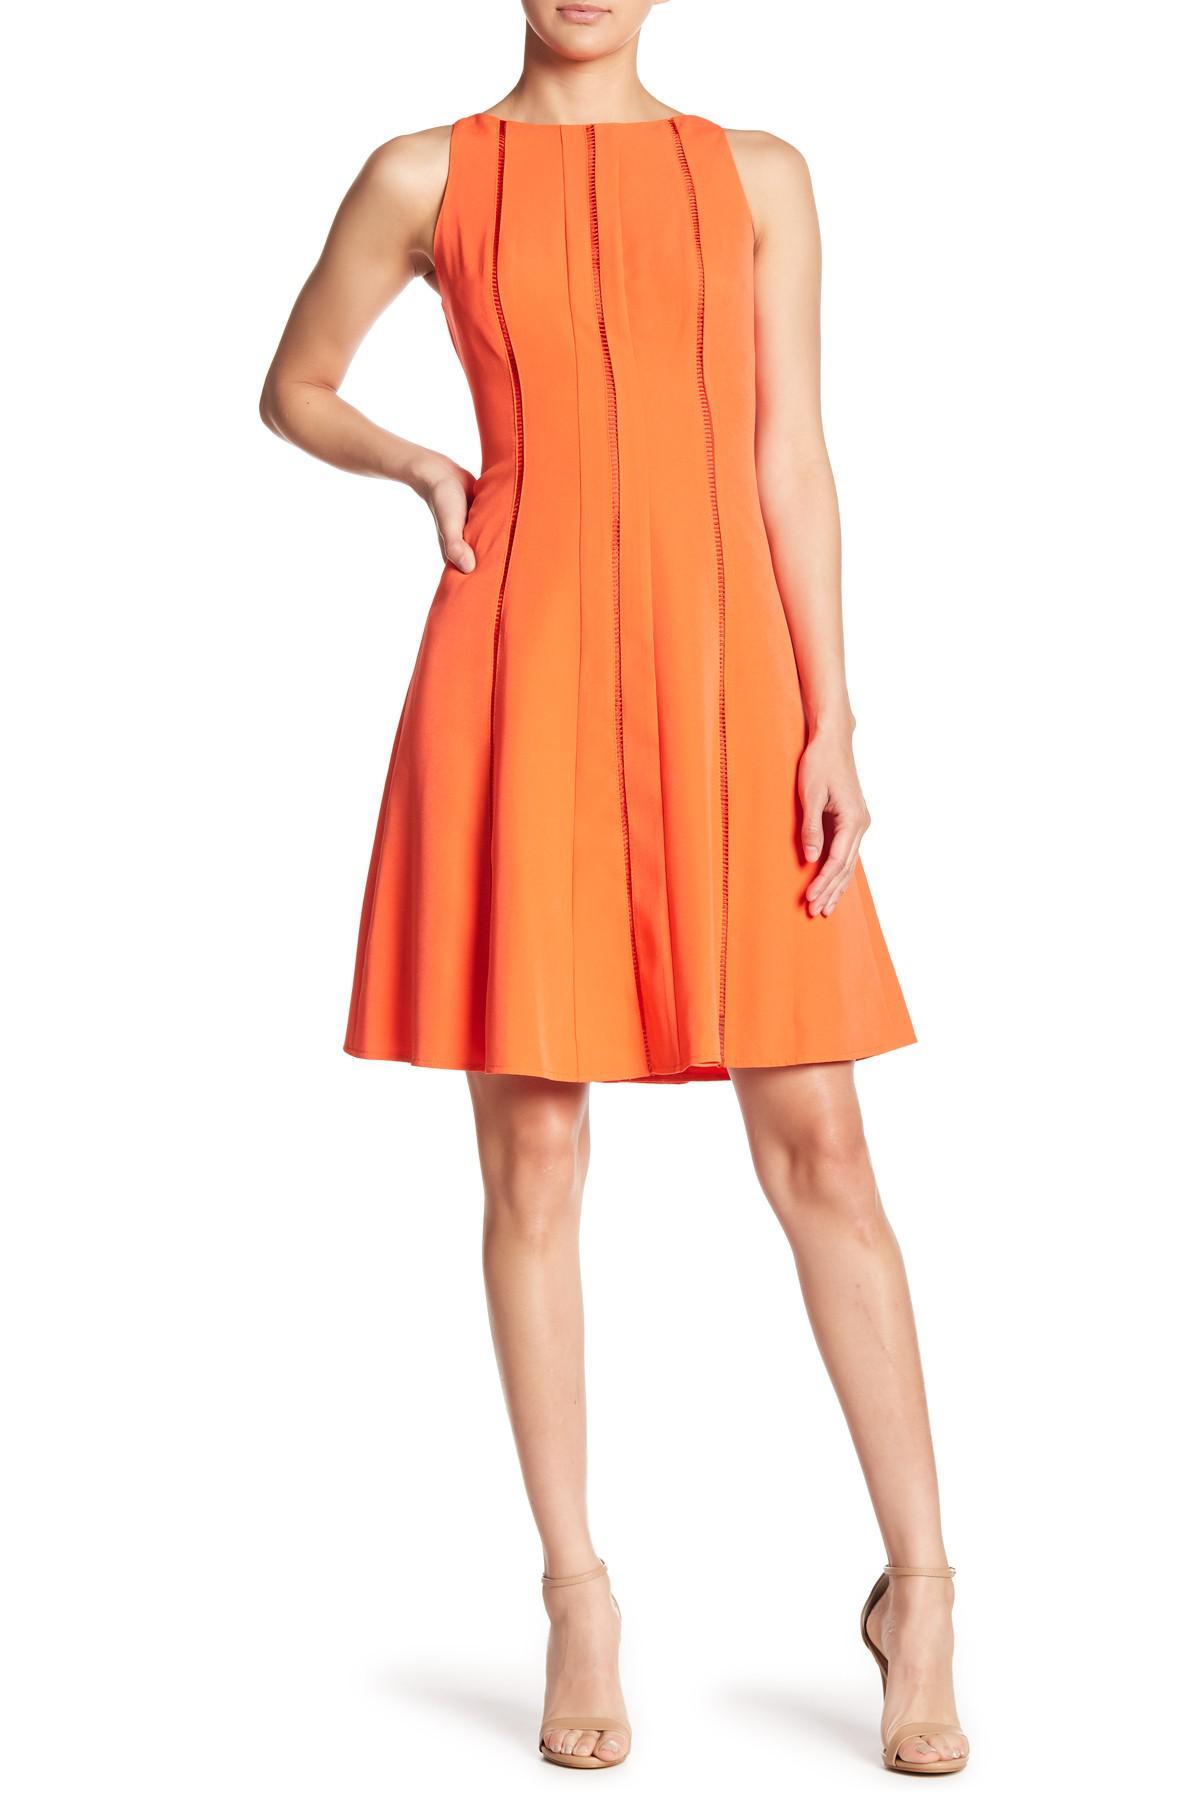 2f82cbf9 Lyst - Maggy London Dream Crepe Fit & Flare Dress in Orange